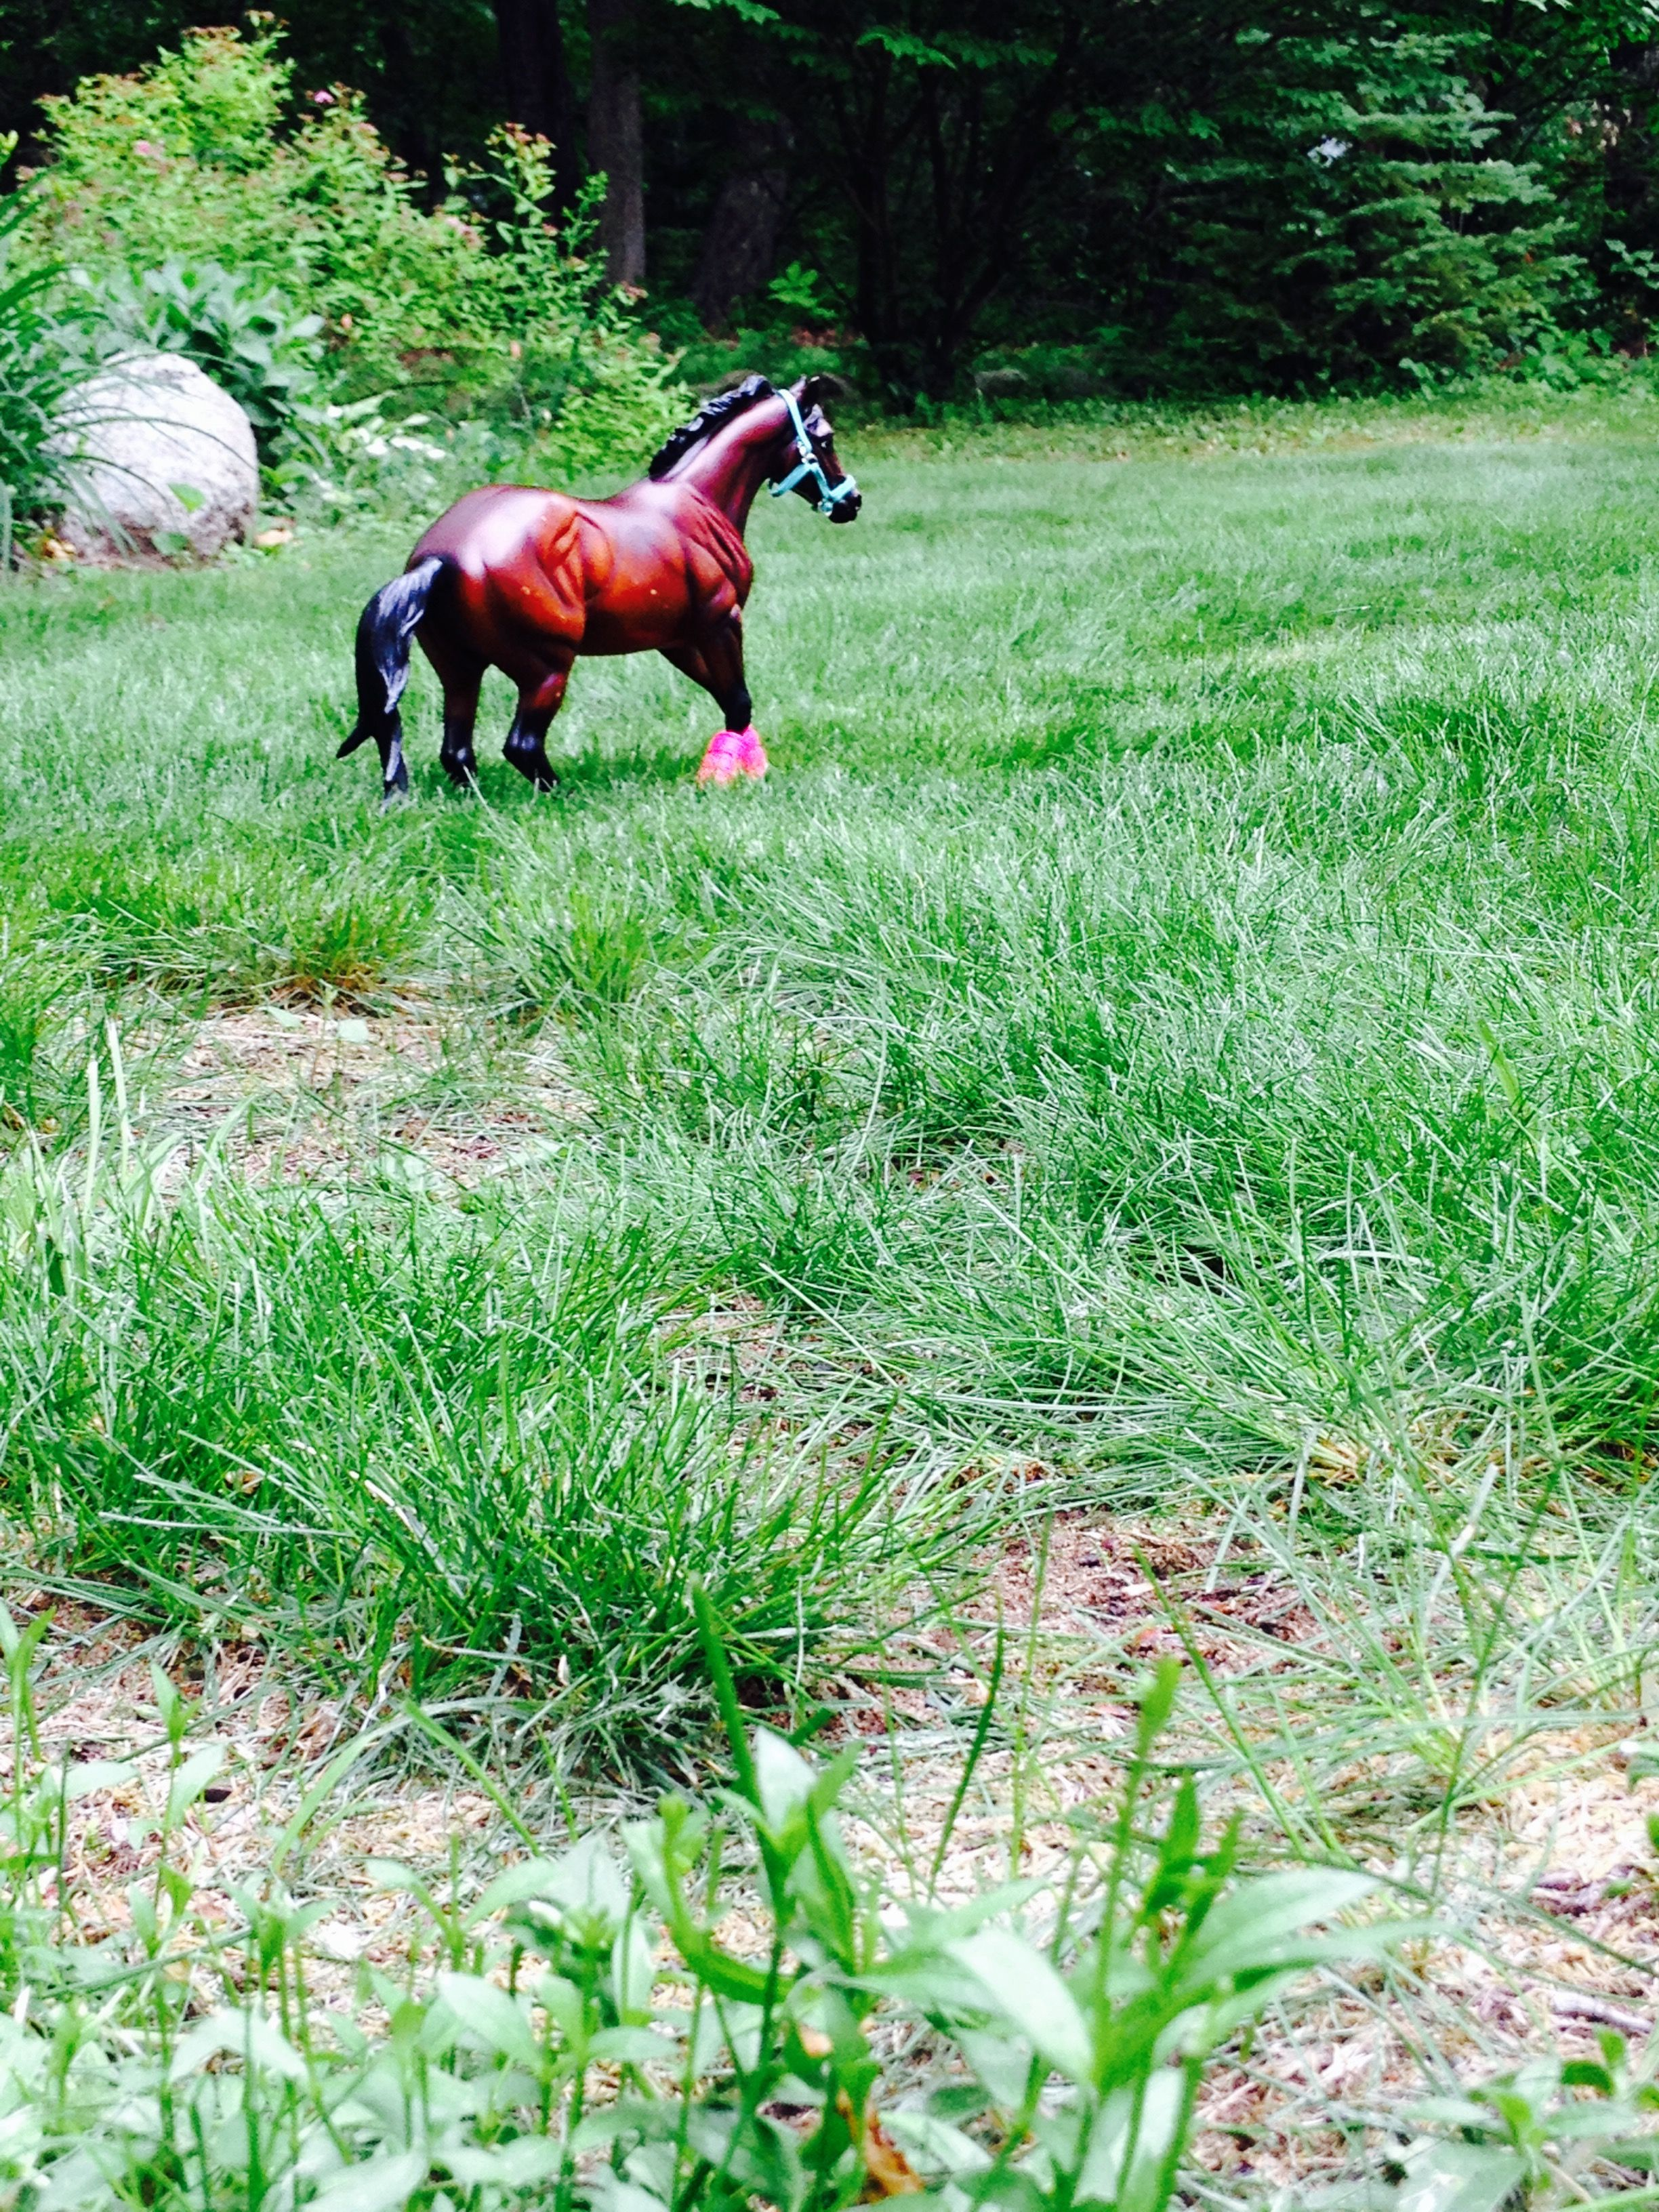 Name: Harley Showname: Harley D. Zip Breed: Quarter Horse Gender: Stallion Owner: Lauren D.